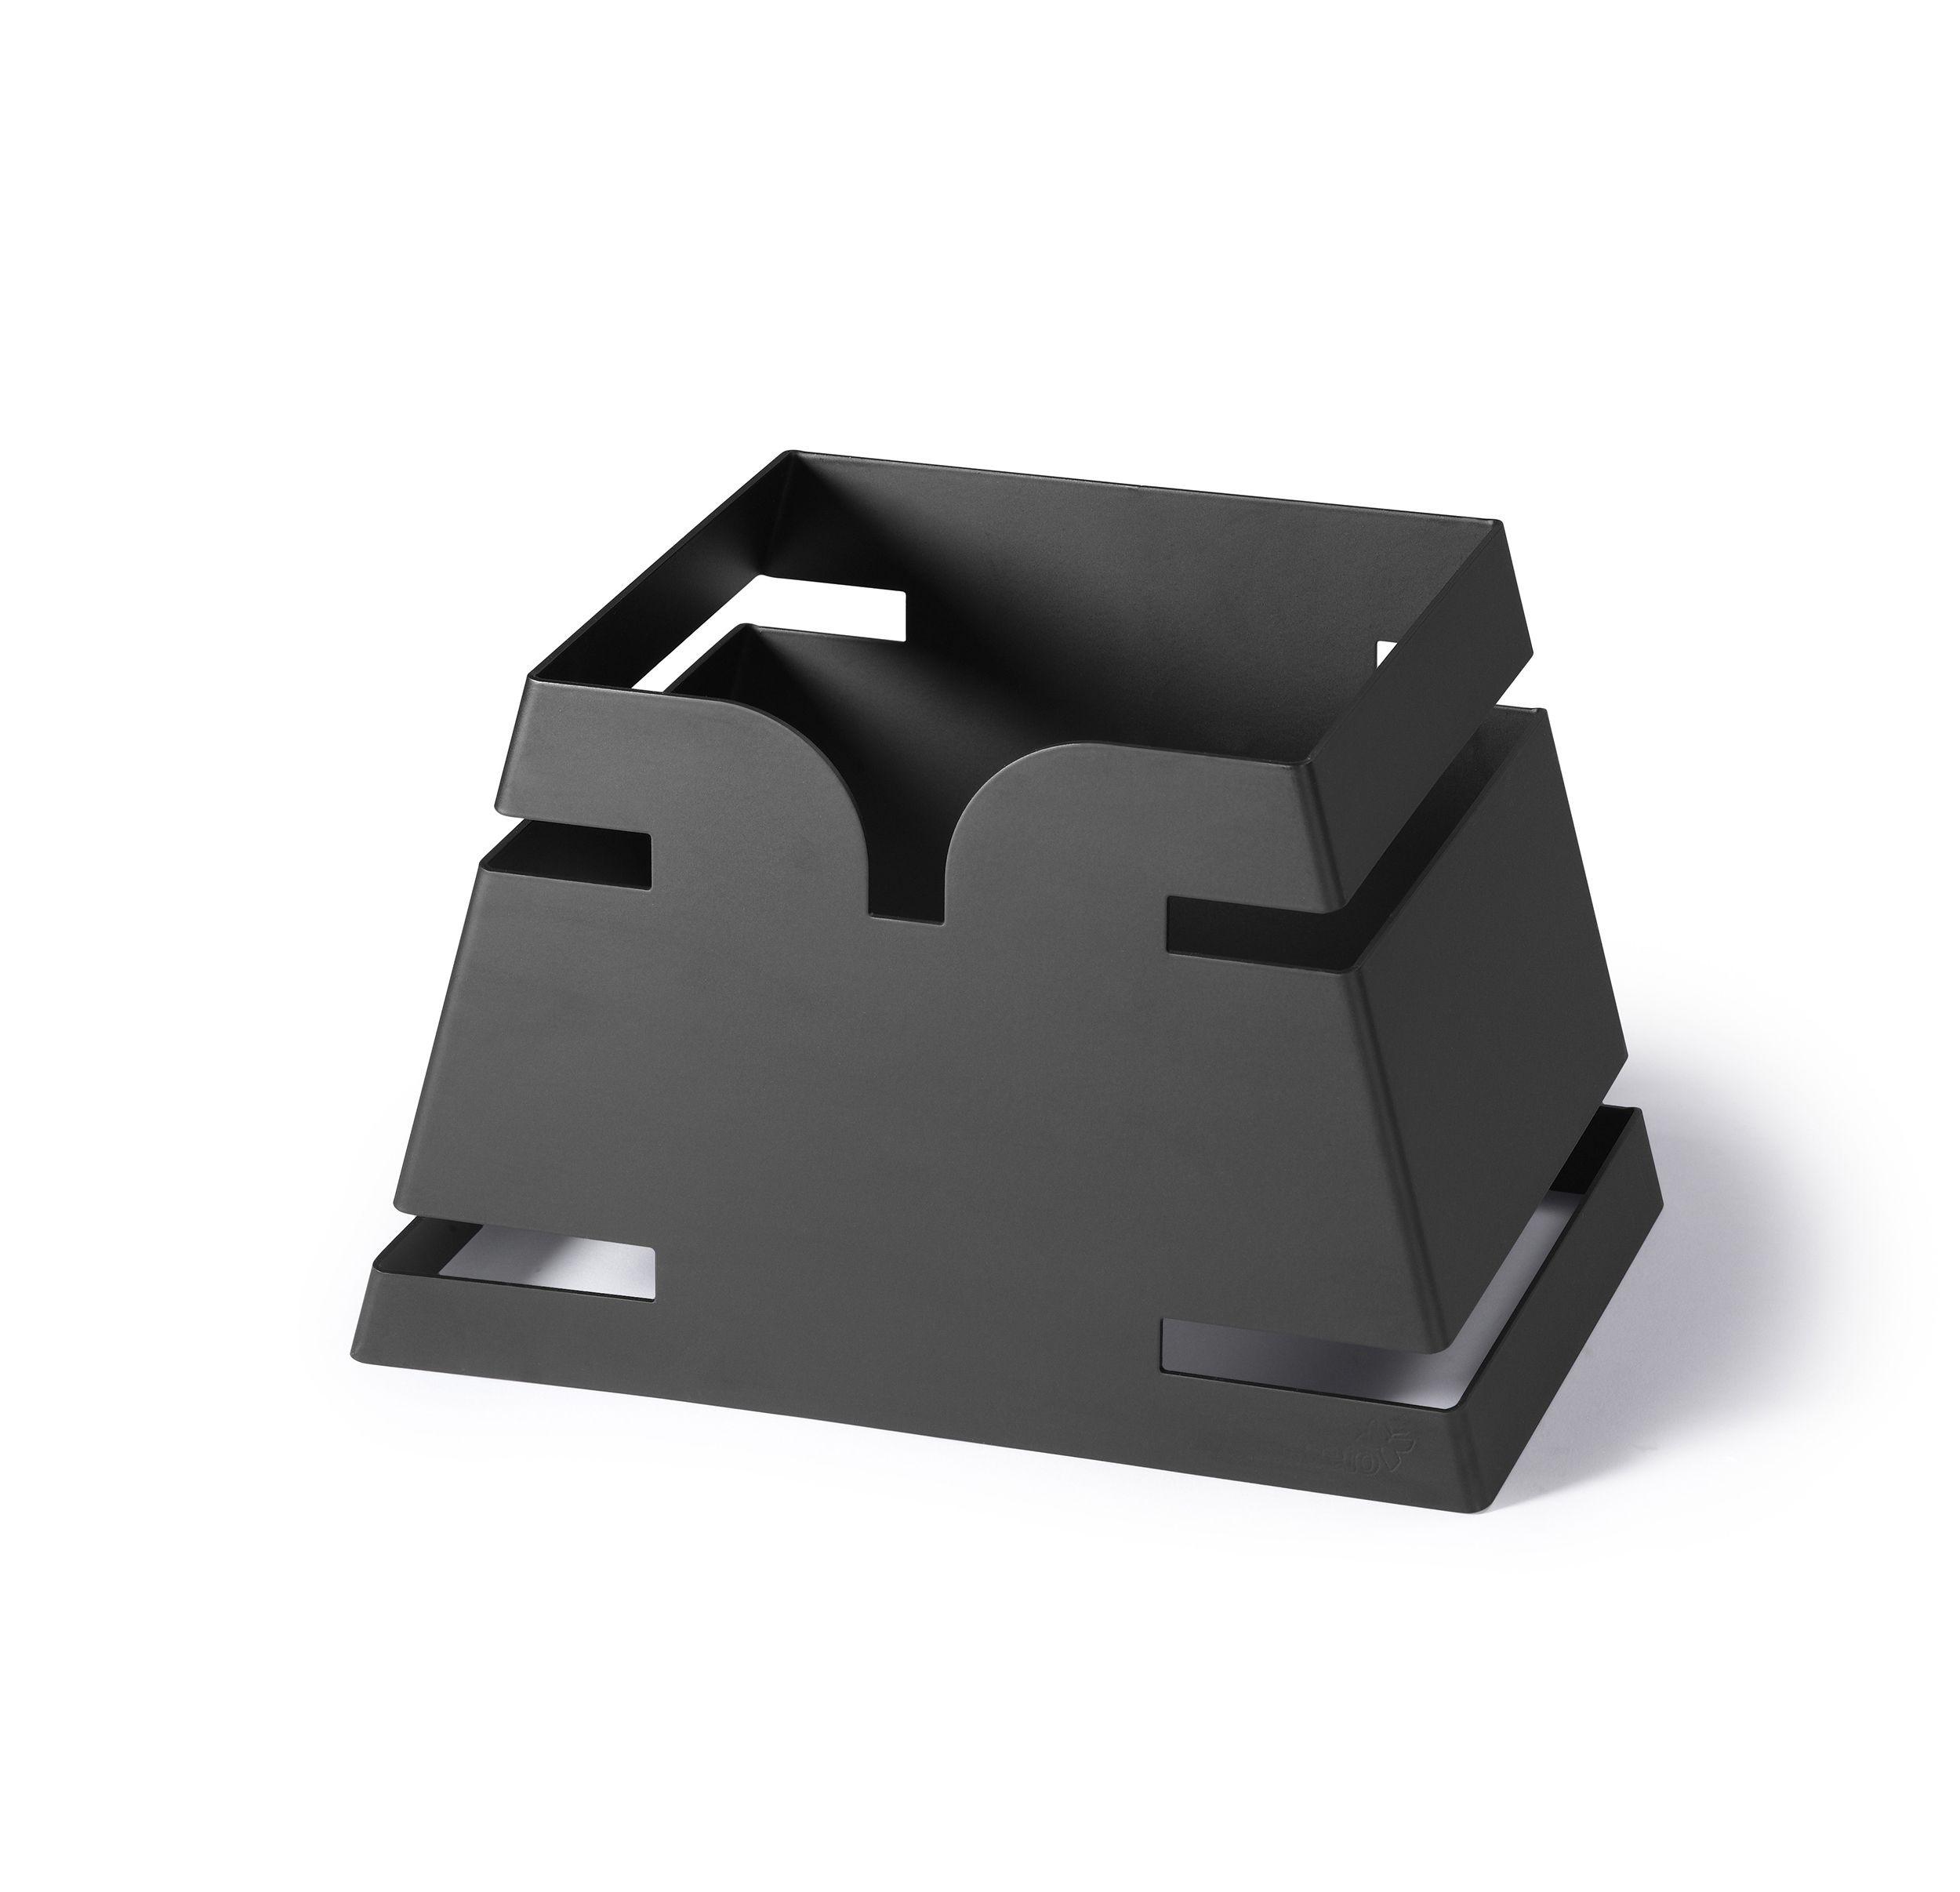 Riser - Black Matte Metal - 11.65